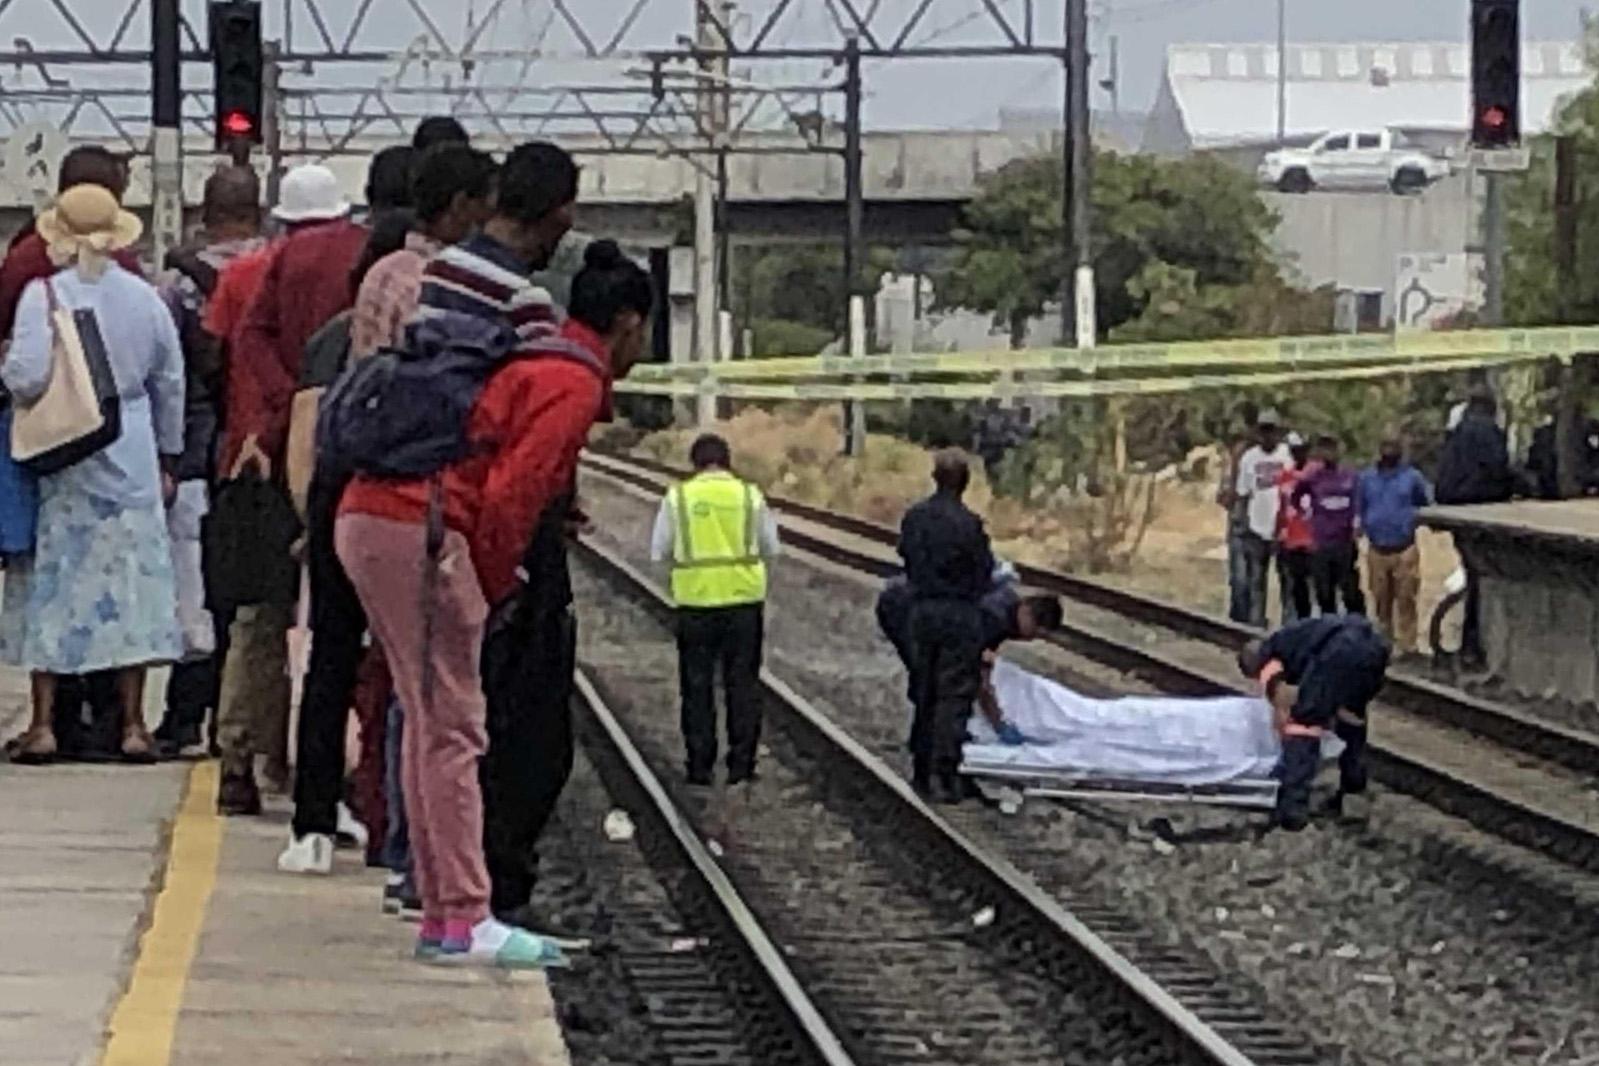 Dead man found on railway tracks   GroundUp